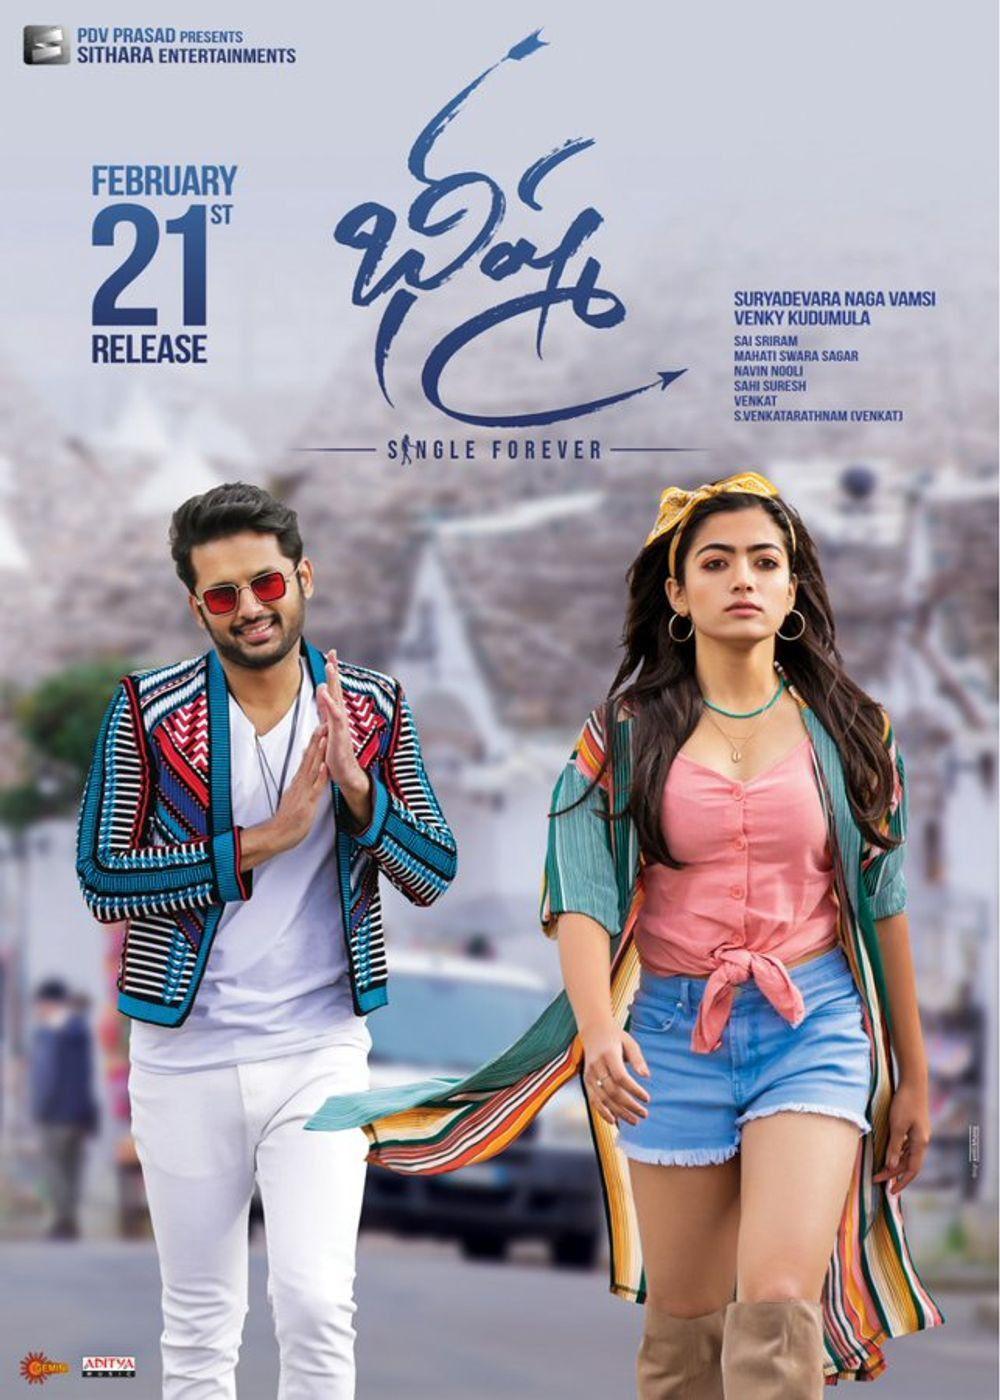 Watch Or Download Bheeshma Full Telugu Movie In Hd 720p In 2020 Telugu Movies Download Latest Hindi Movies Telugu Movies